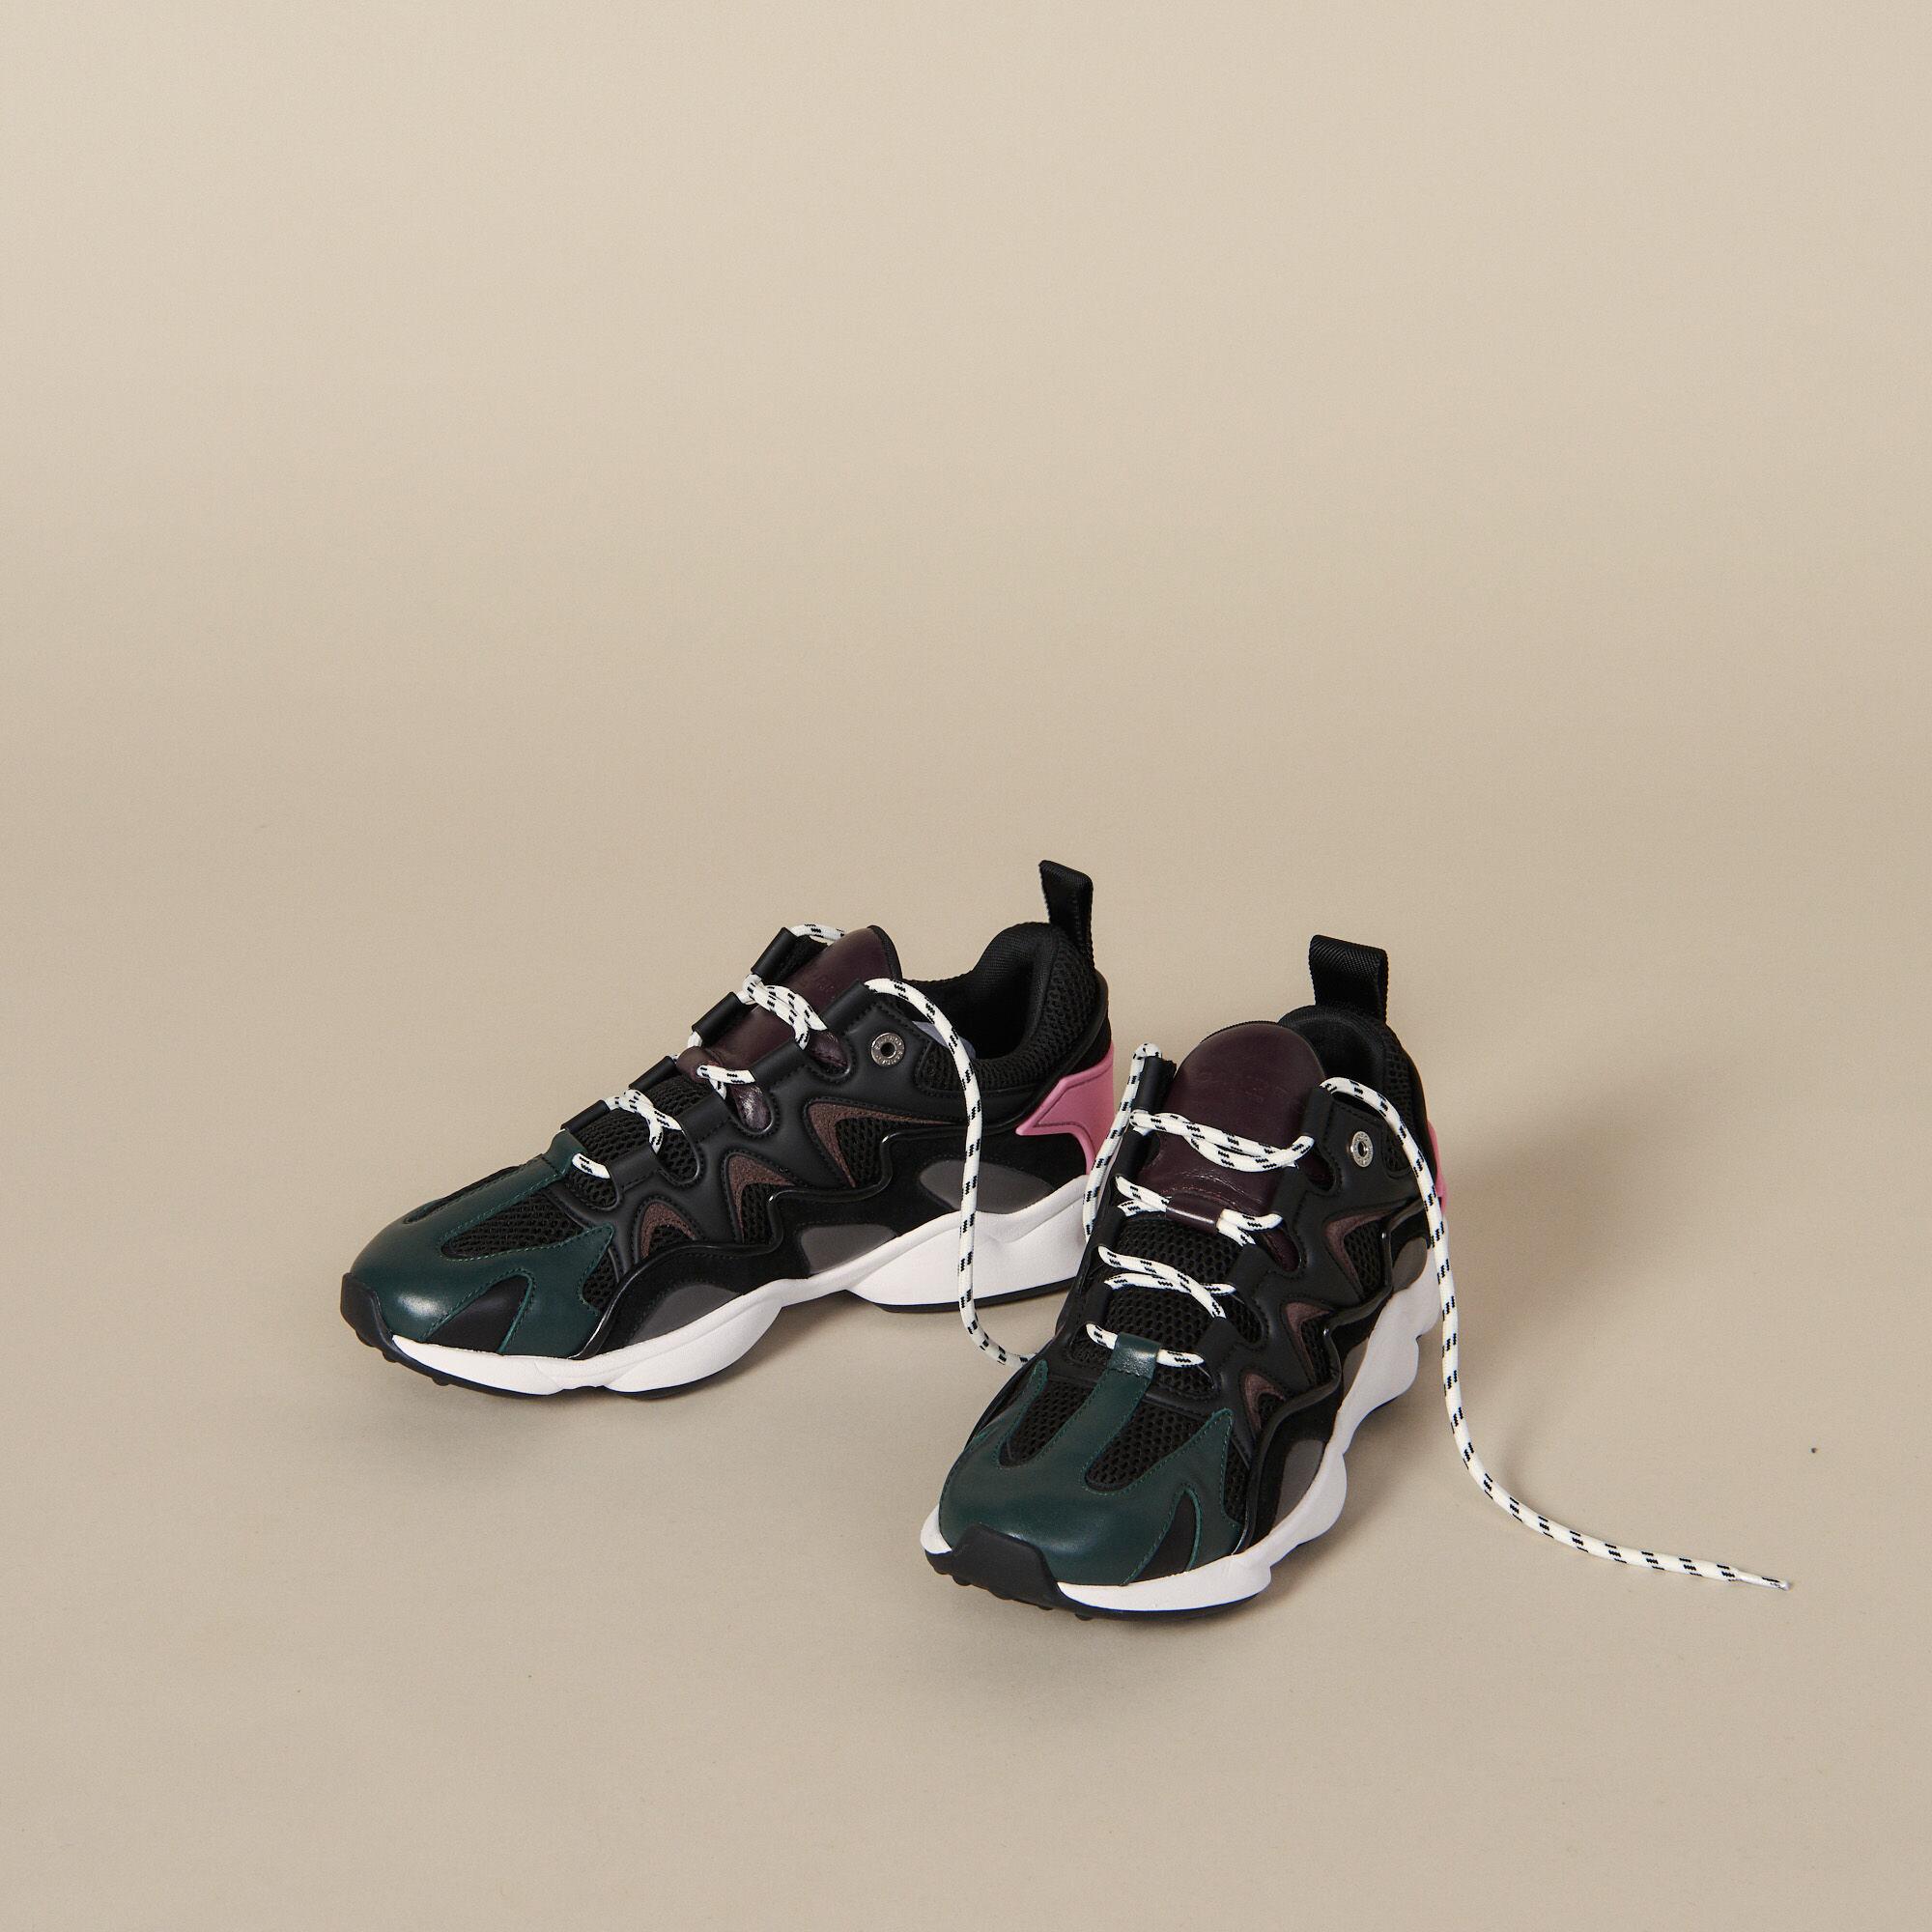 HommeNouveaux Chaussures TendanceMode Chaussure Chaussures Modèles Modèles Chaussure HommeNouveaux HommeNouveaux Chaussure Modèles Chaussures TendanceMode nN80mw